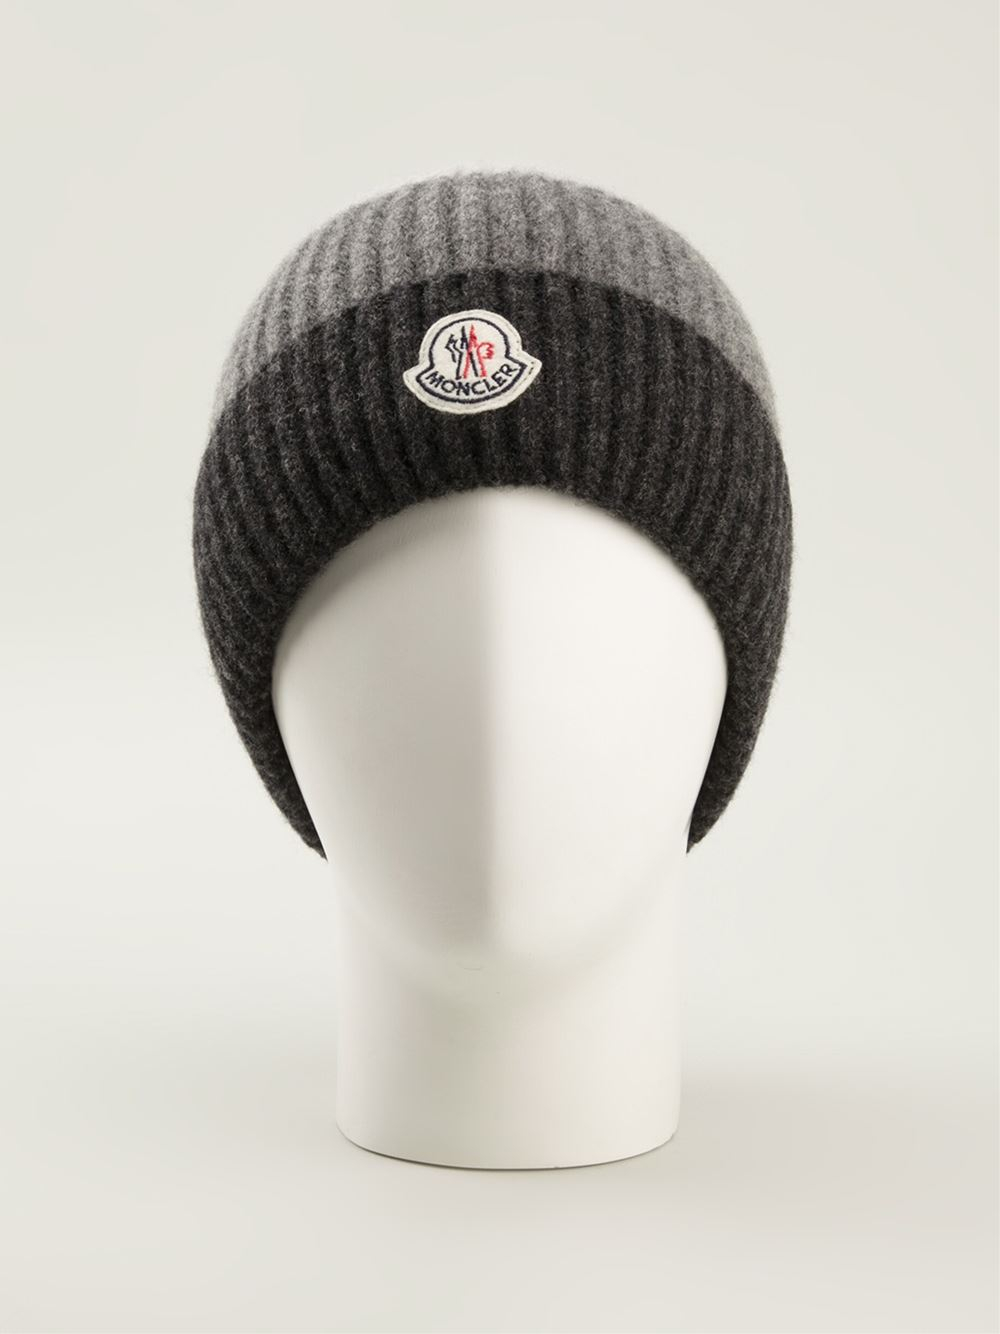 Lyst - Moncler Striped Beanie Hat in Black for Men ba46771b945